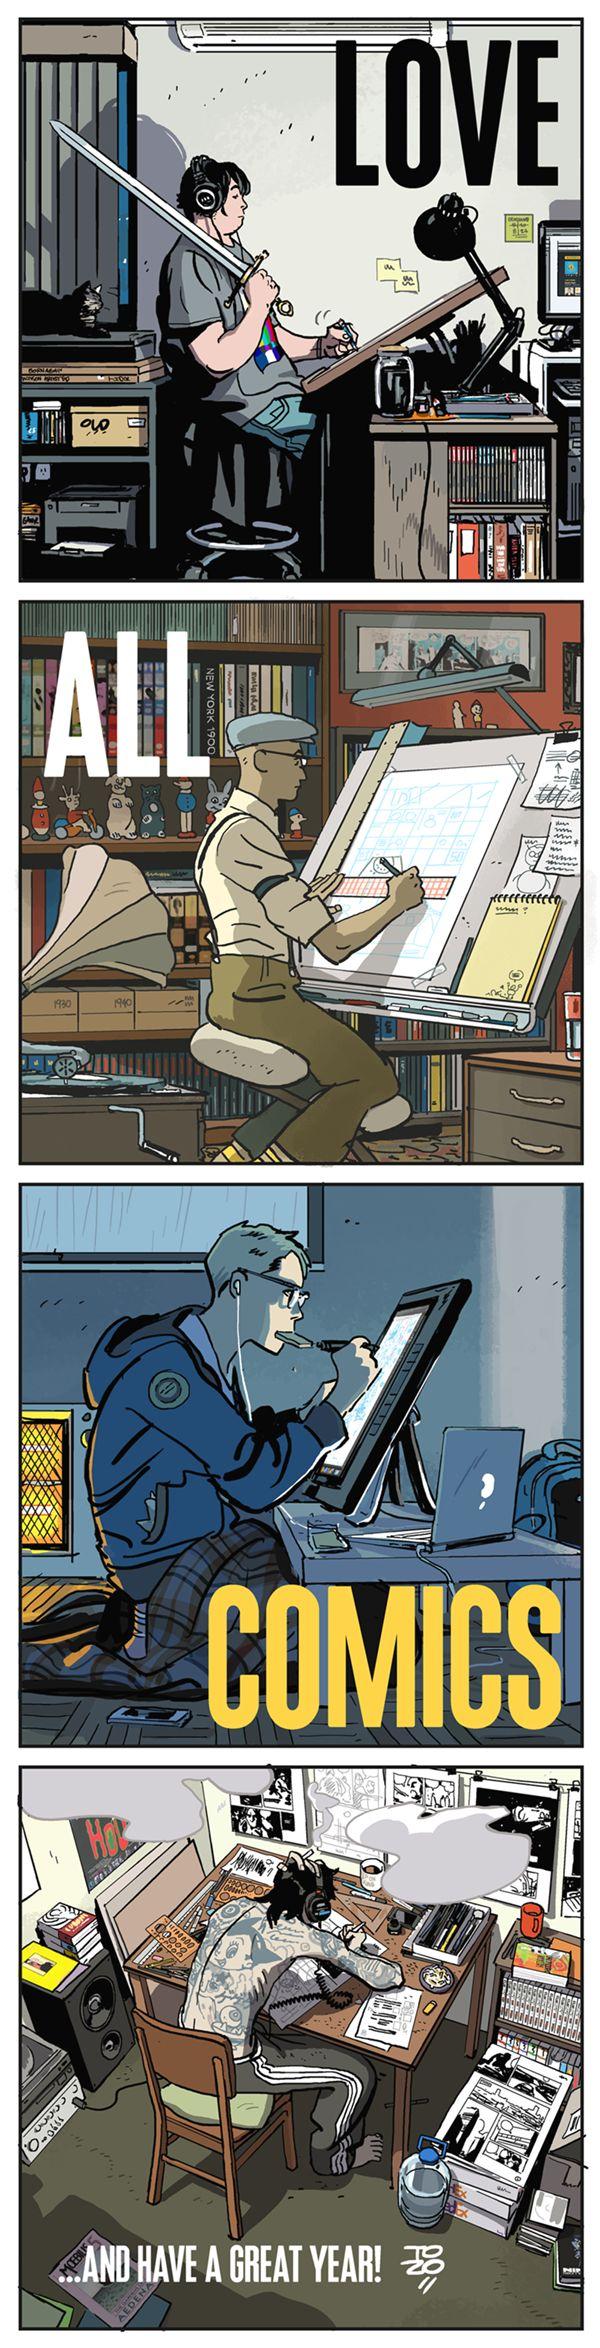 Love All Comics by Tonci Zonjic